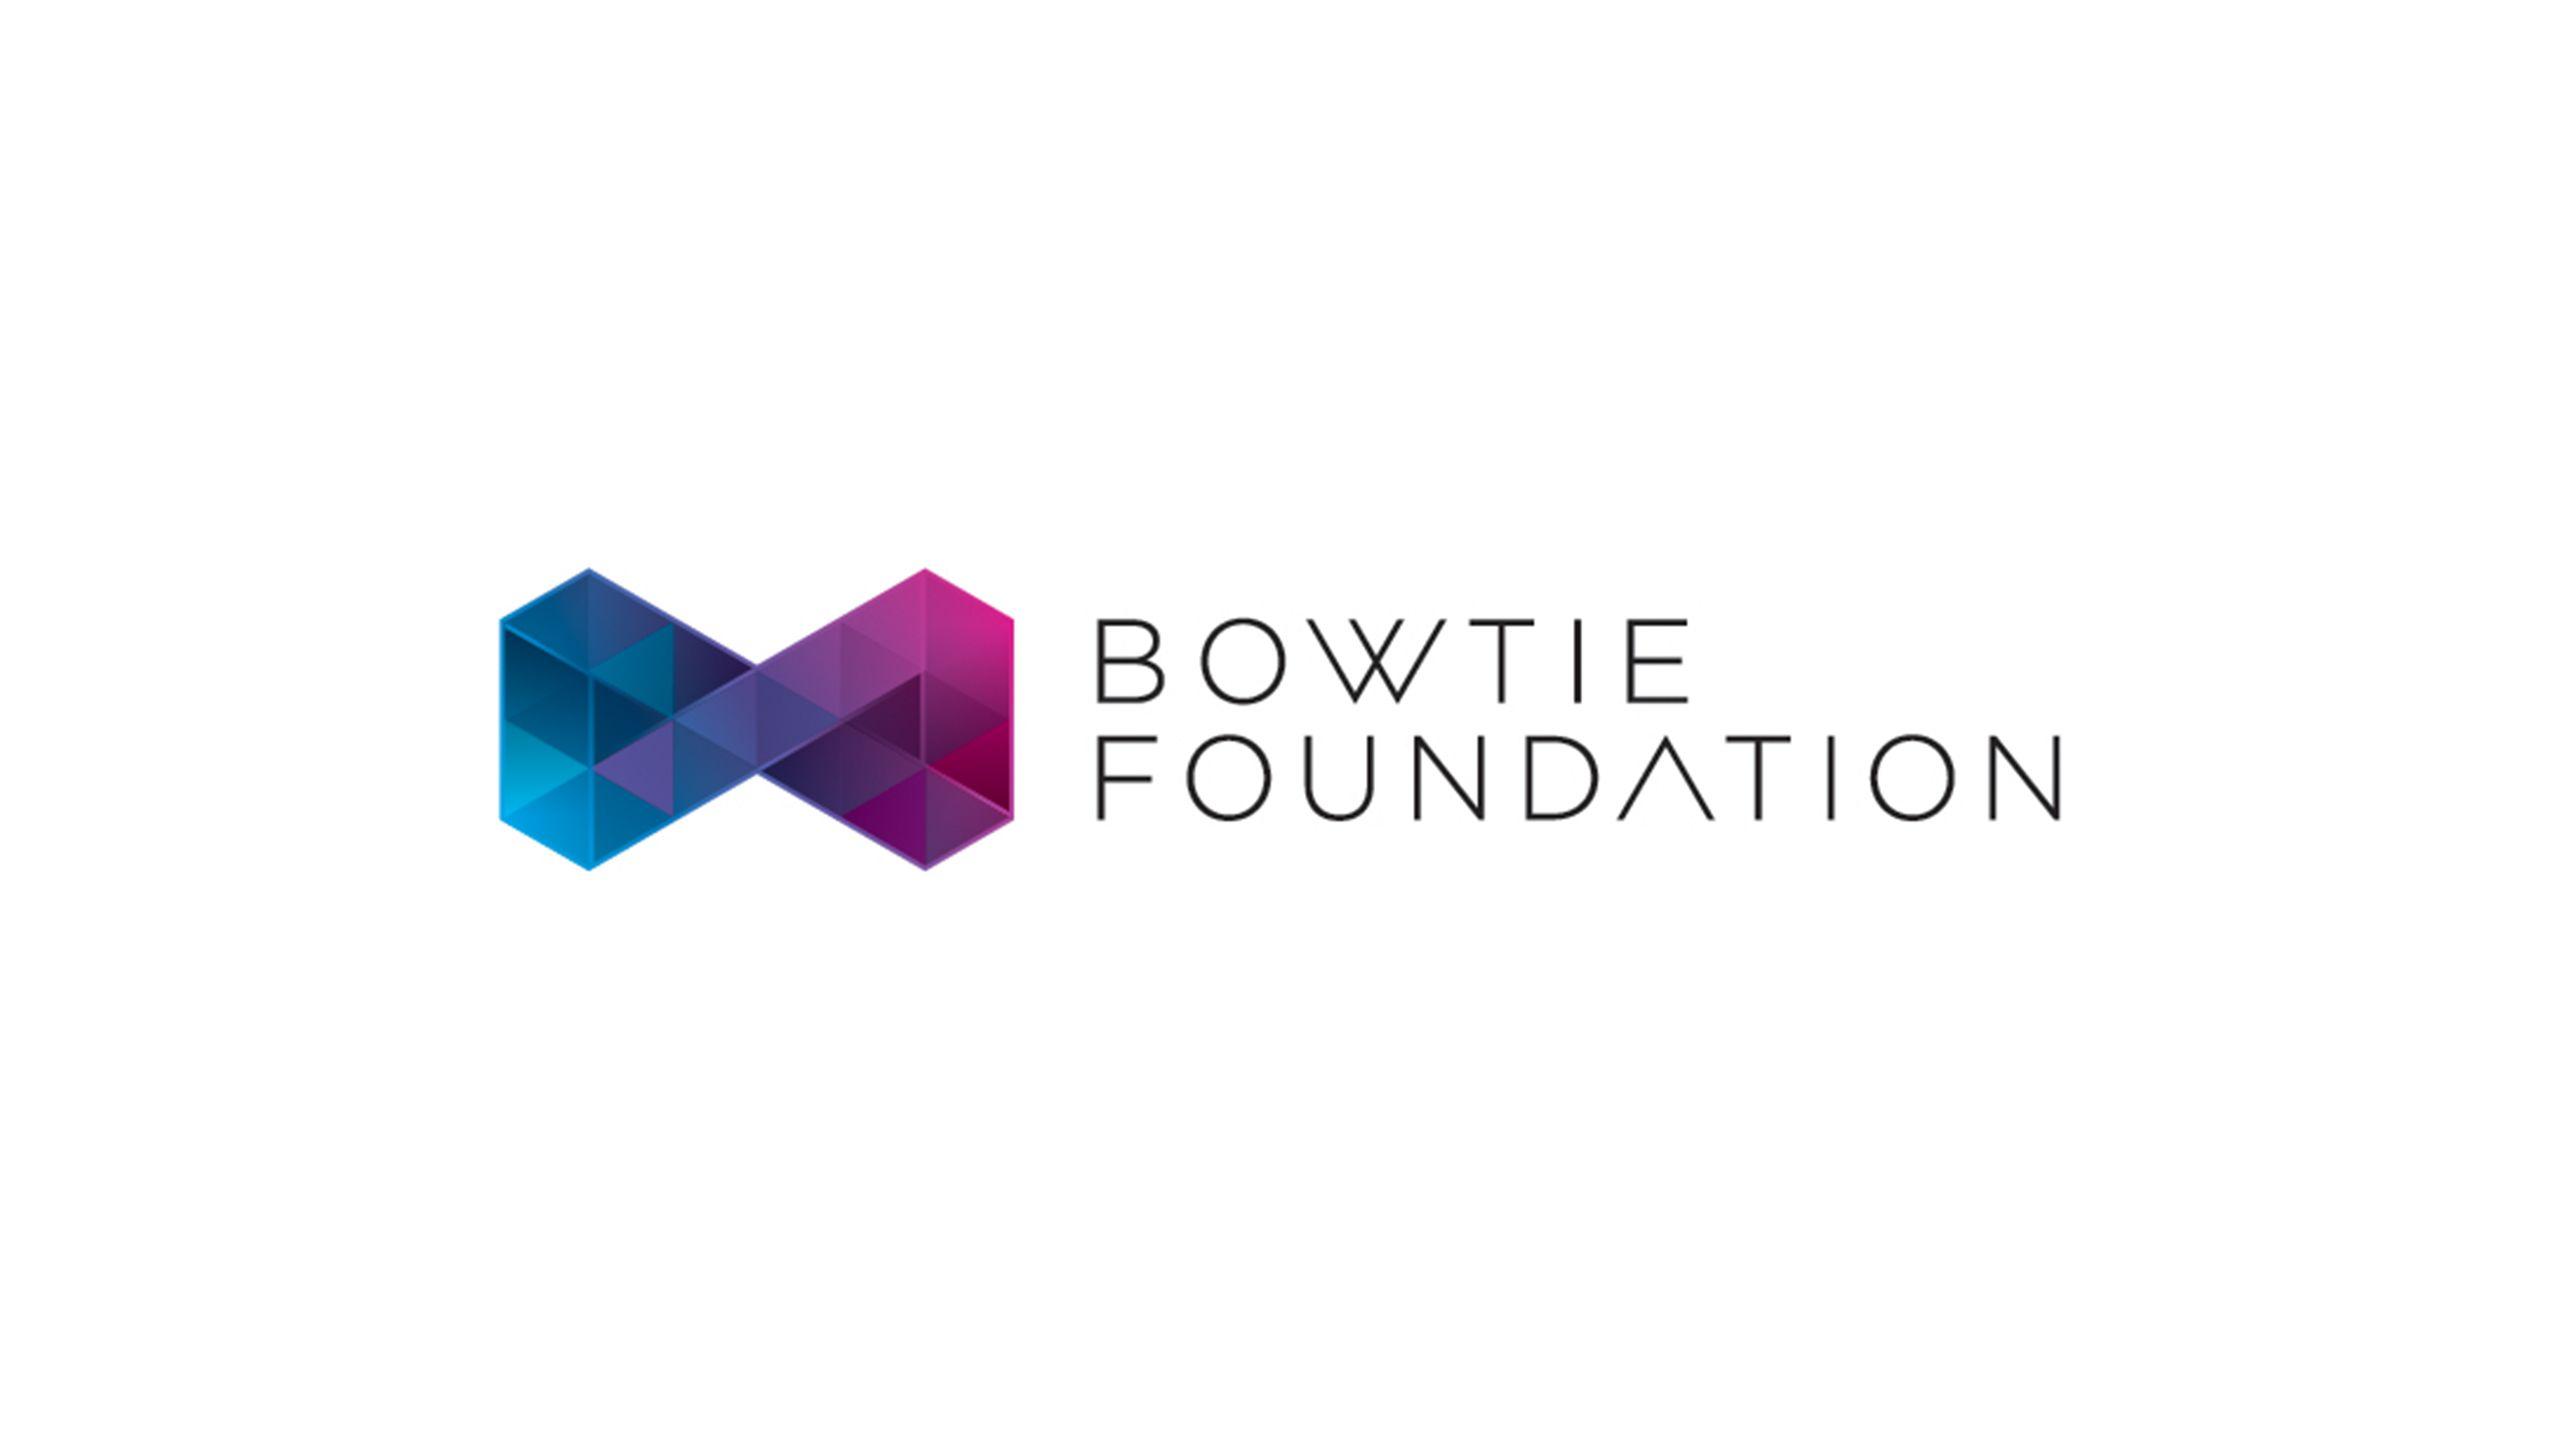 Dhani Jones' BowTie Foundation